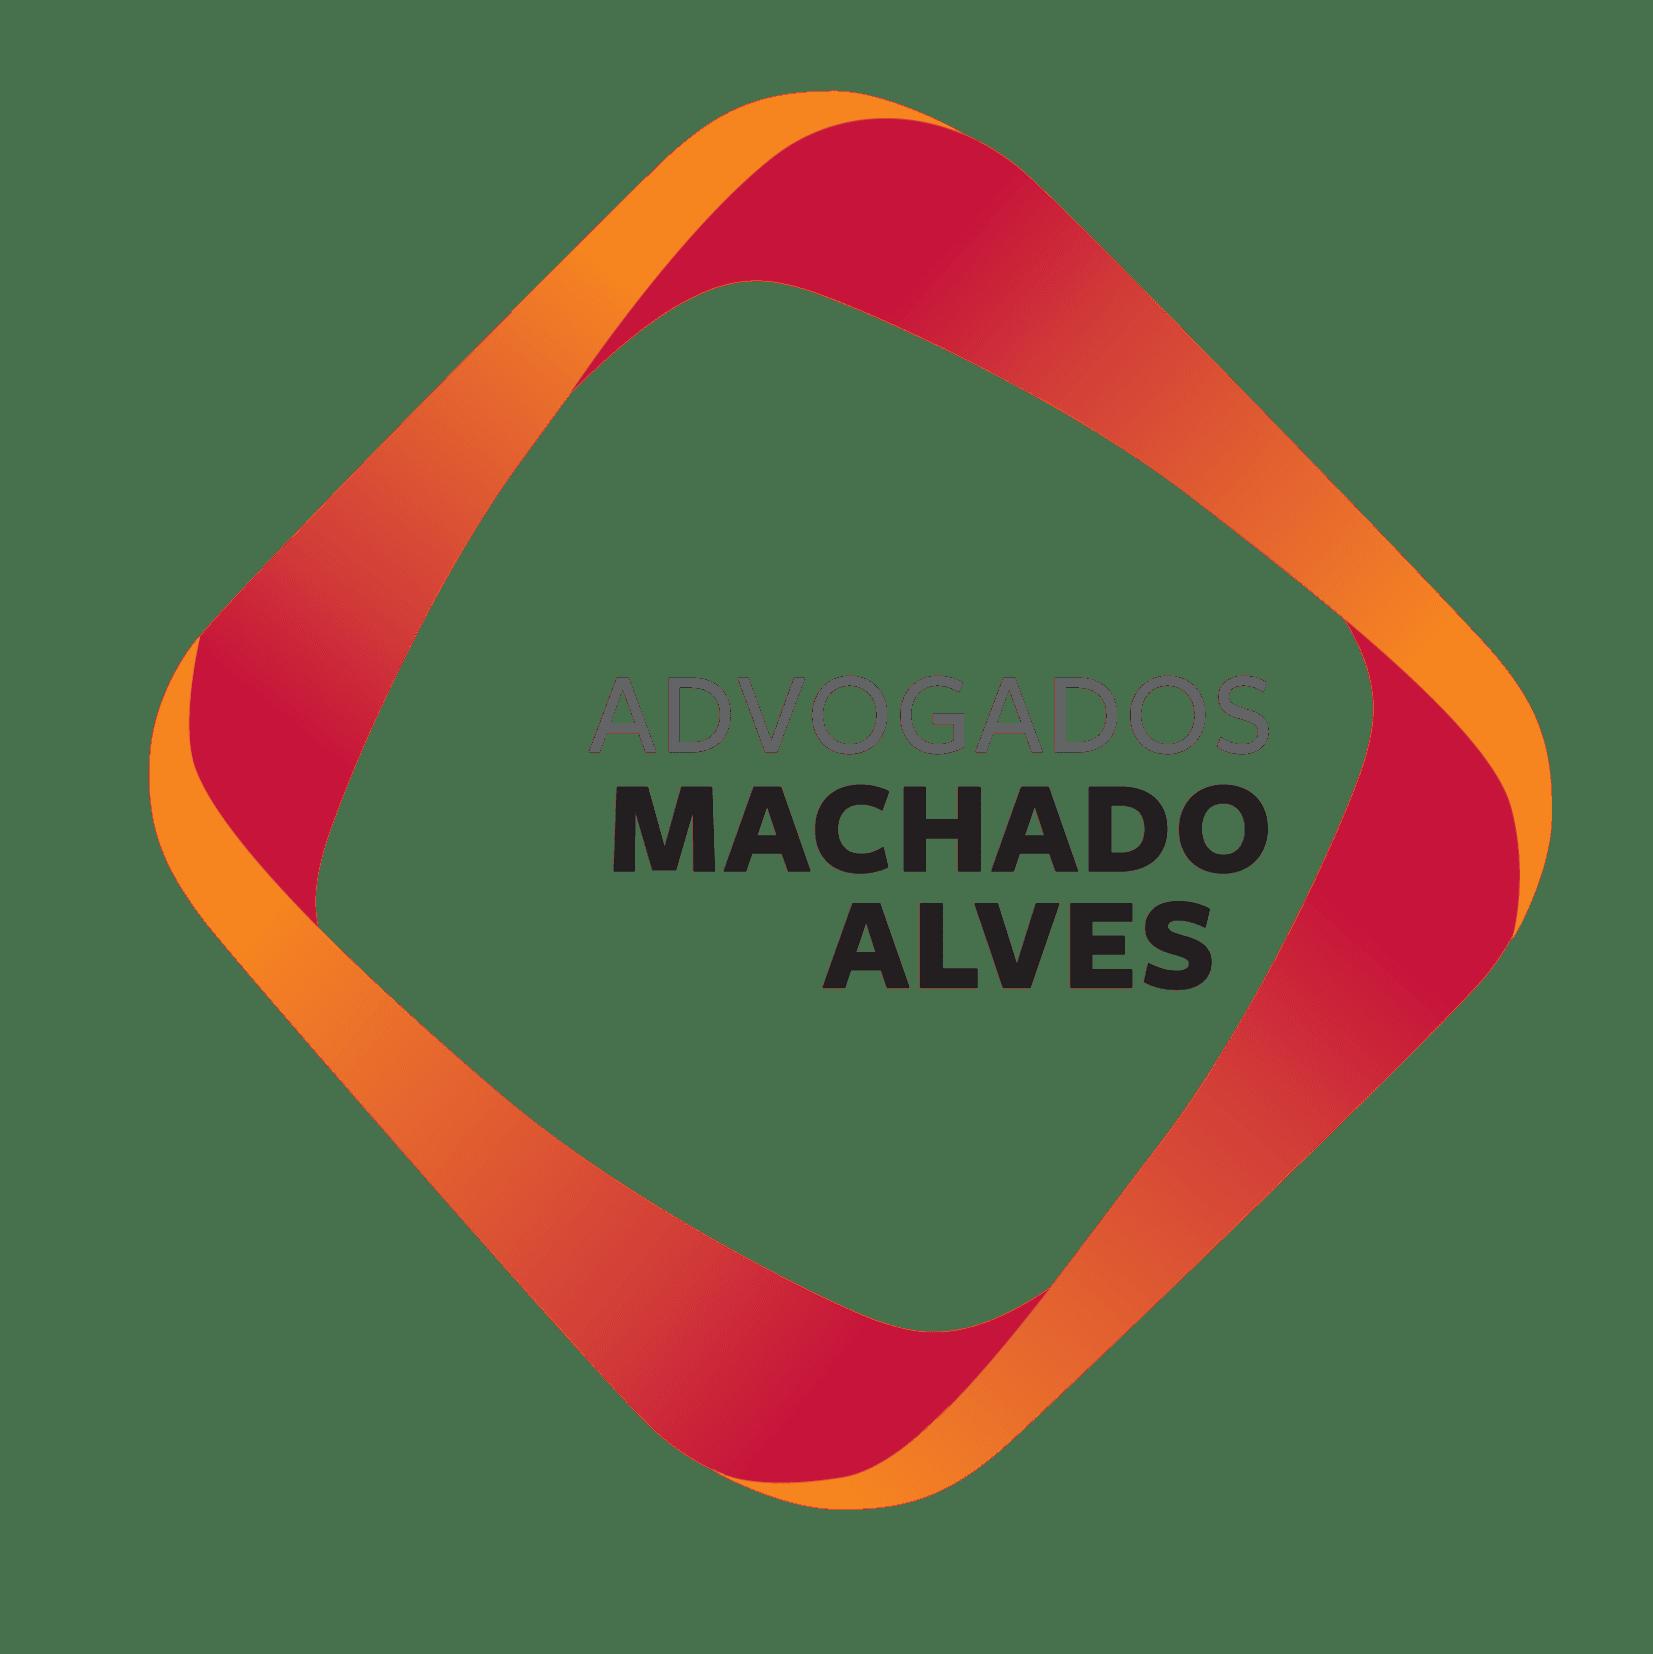 Machado Alves Advogados